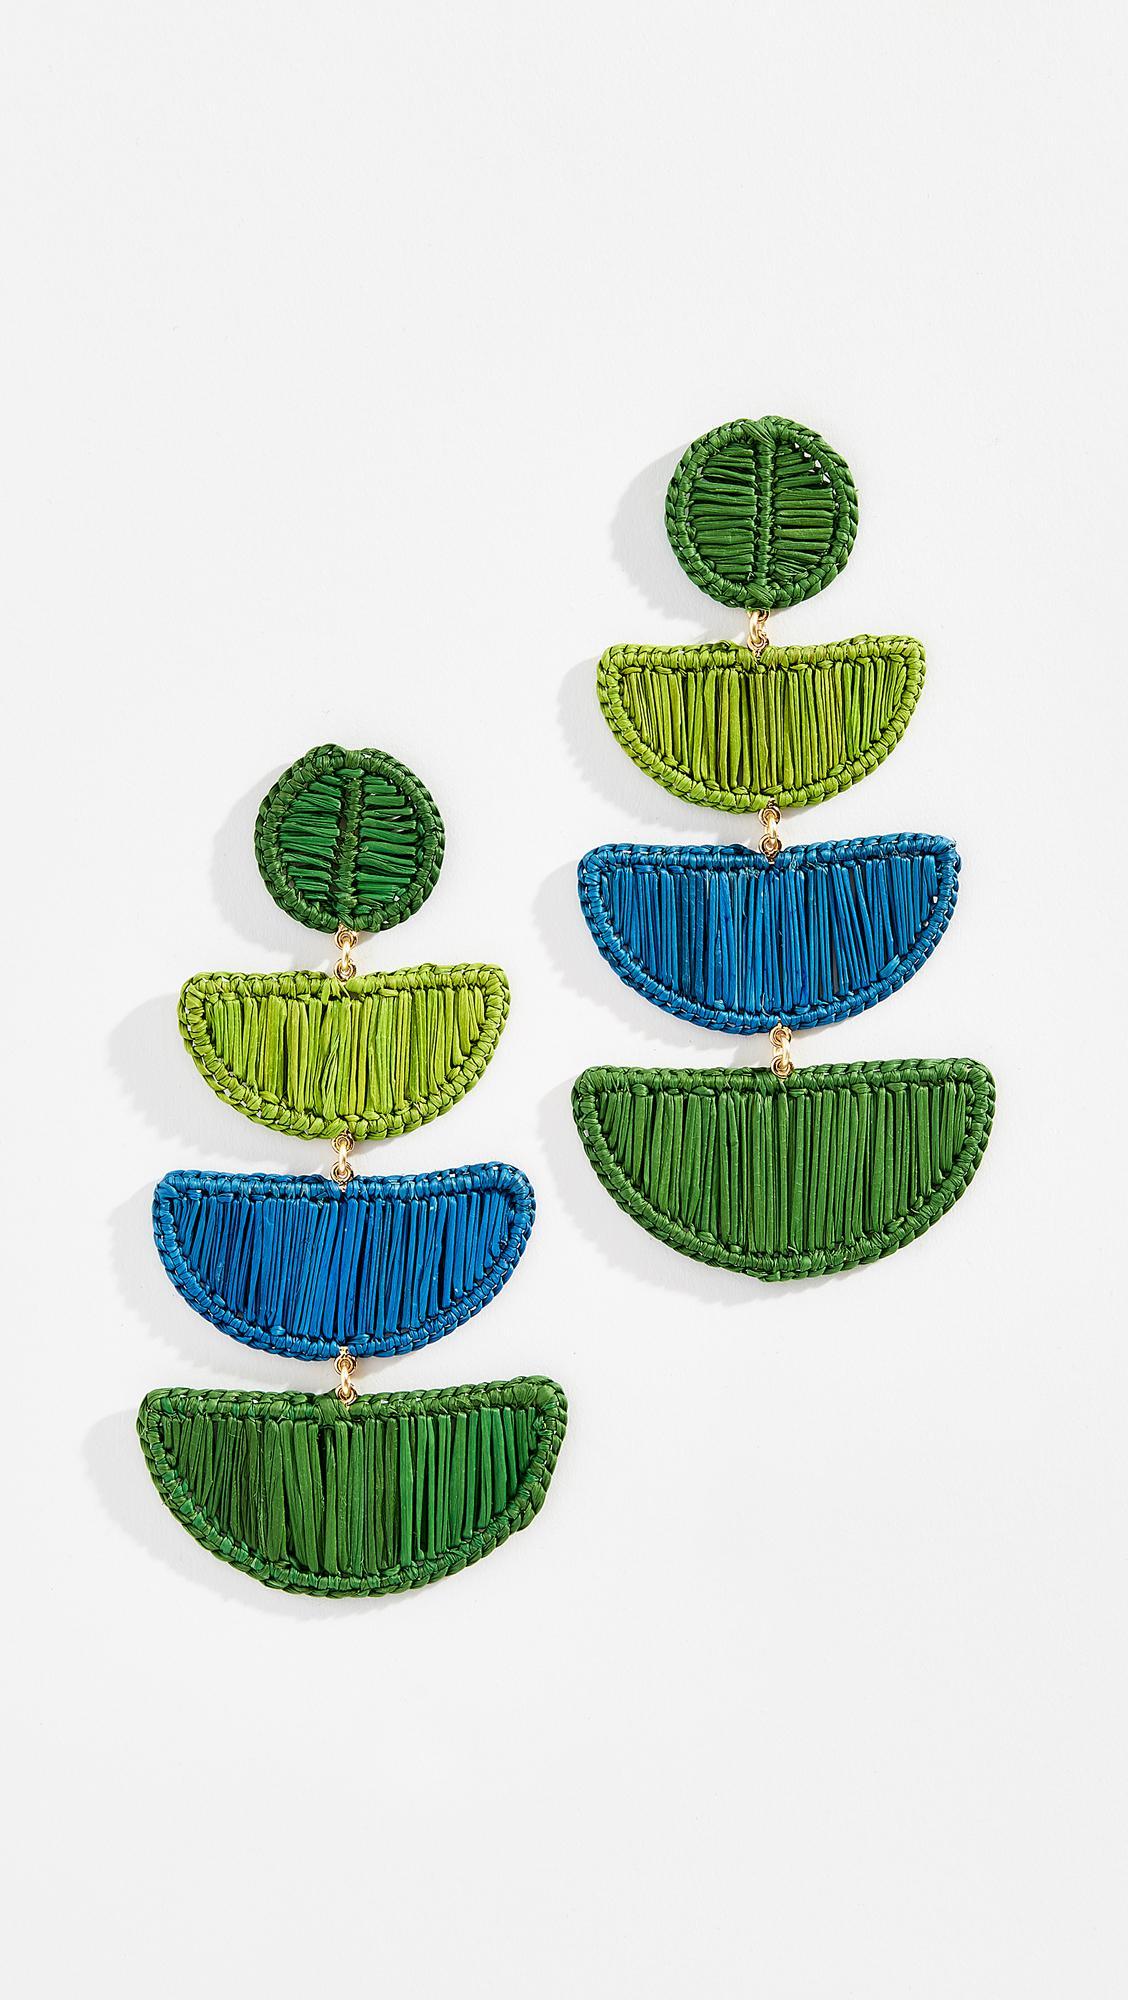 Mercedes Salazar Móvil Azul y Verde Earrings y5v5O9KXb